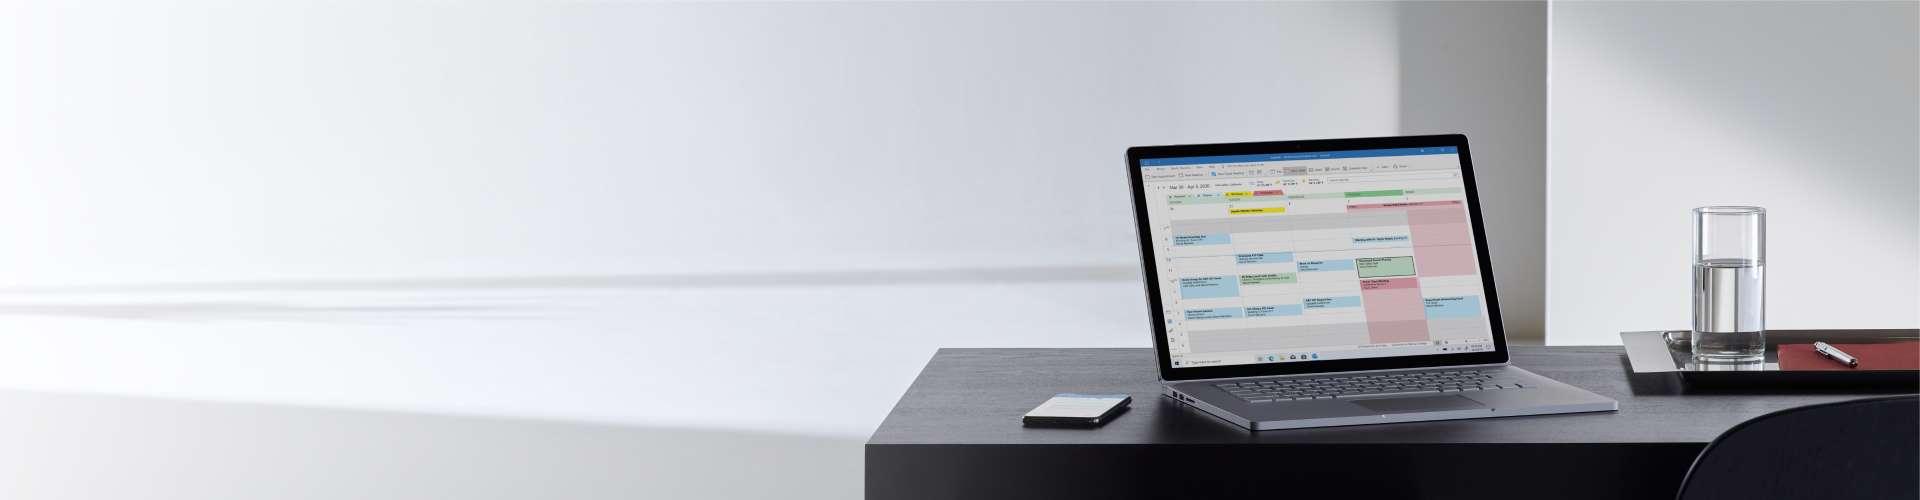 Outlook op laptop en mobiel